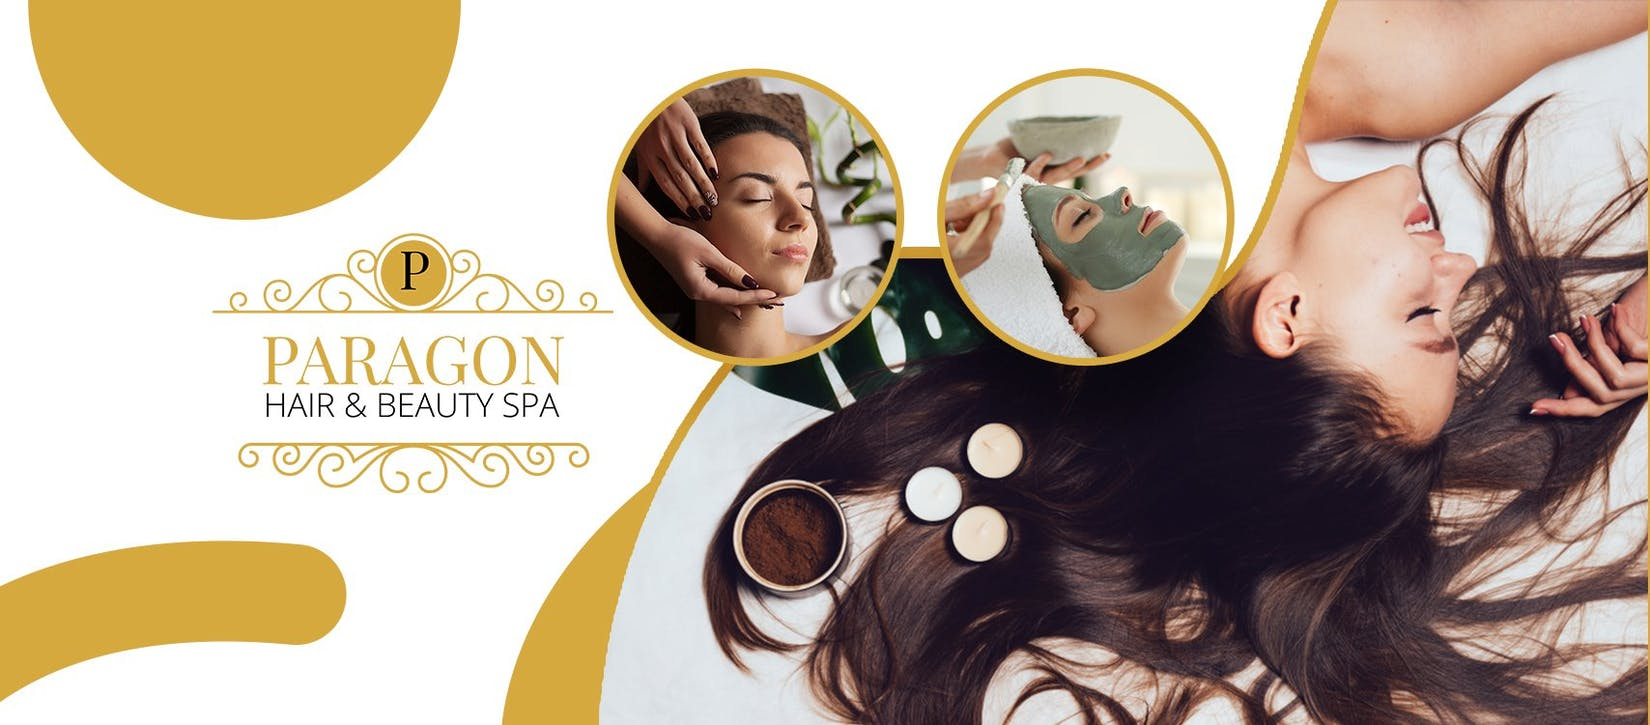 Paragon Hair and Beauty Spa   Beauty